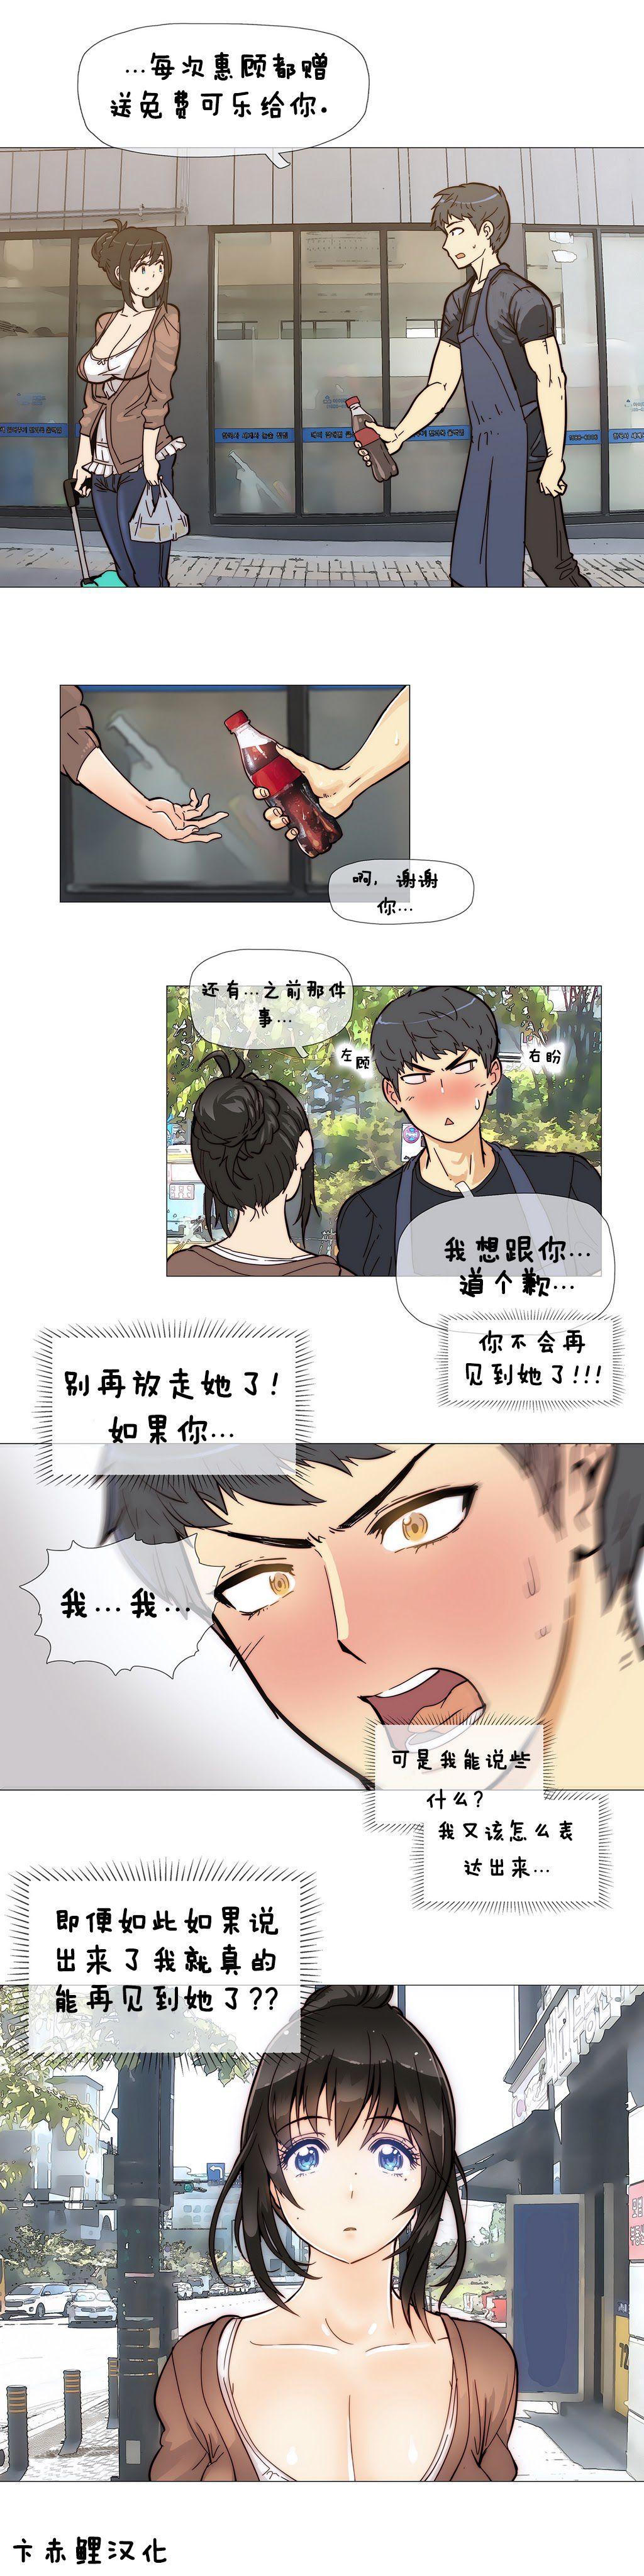 HouseHold Affairs 【卞赤鲤个人汉化】1~21话(持续更新中) 78